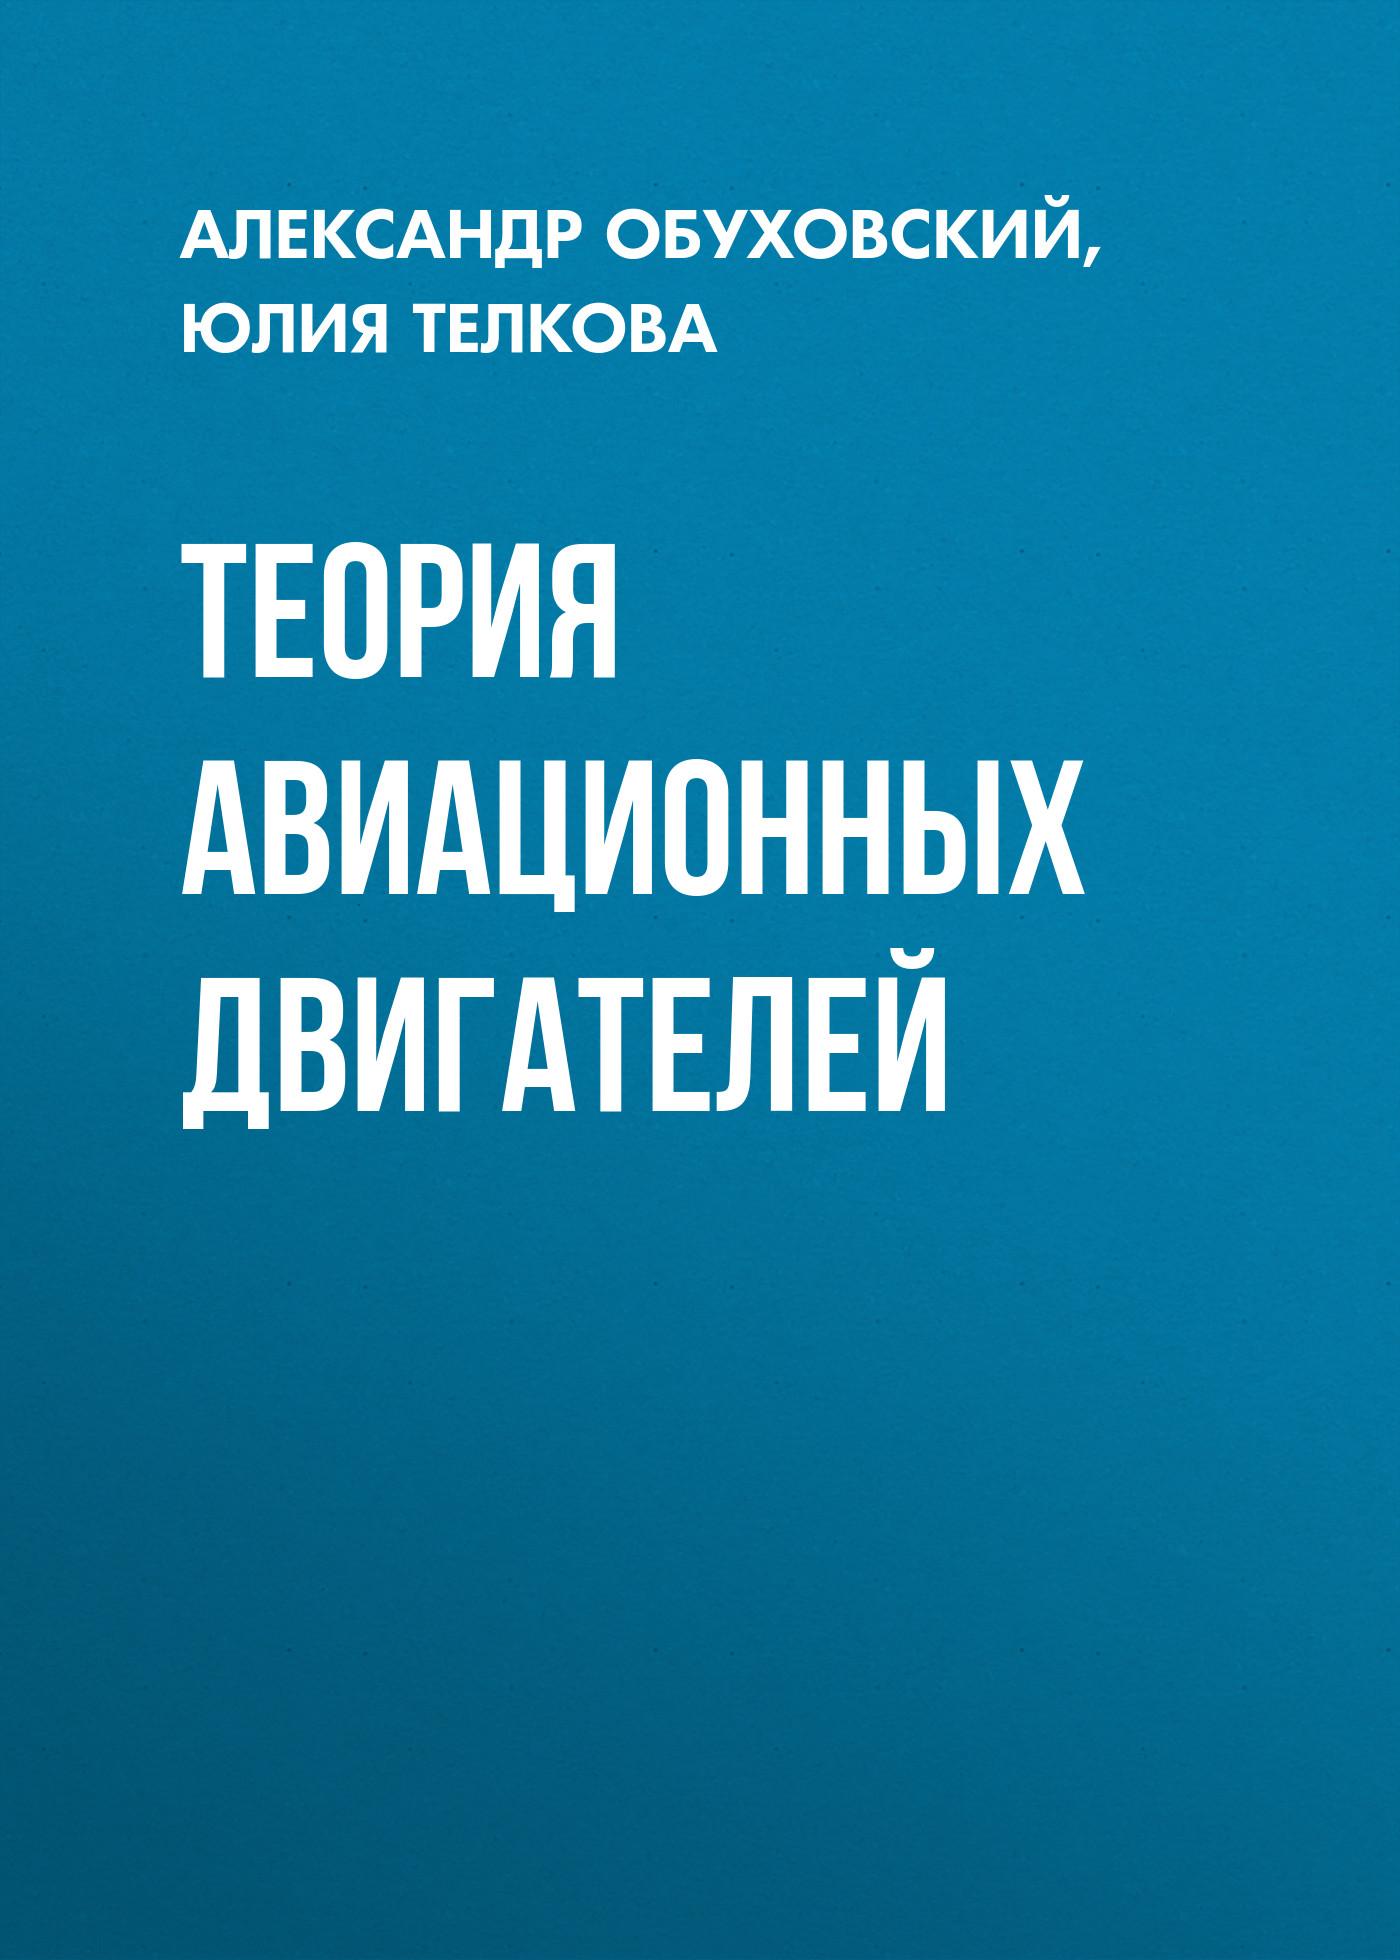 Александр Обуховский Теория авиационных двигателей